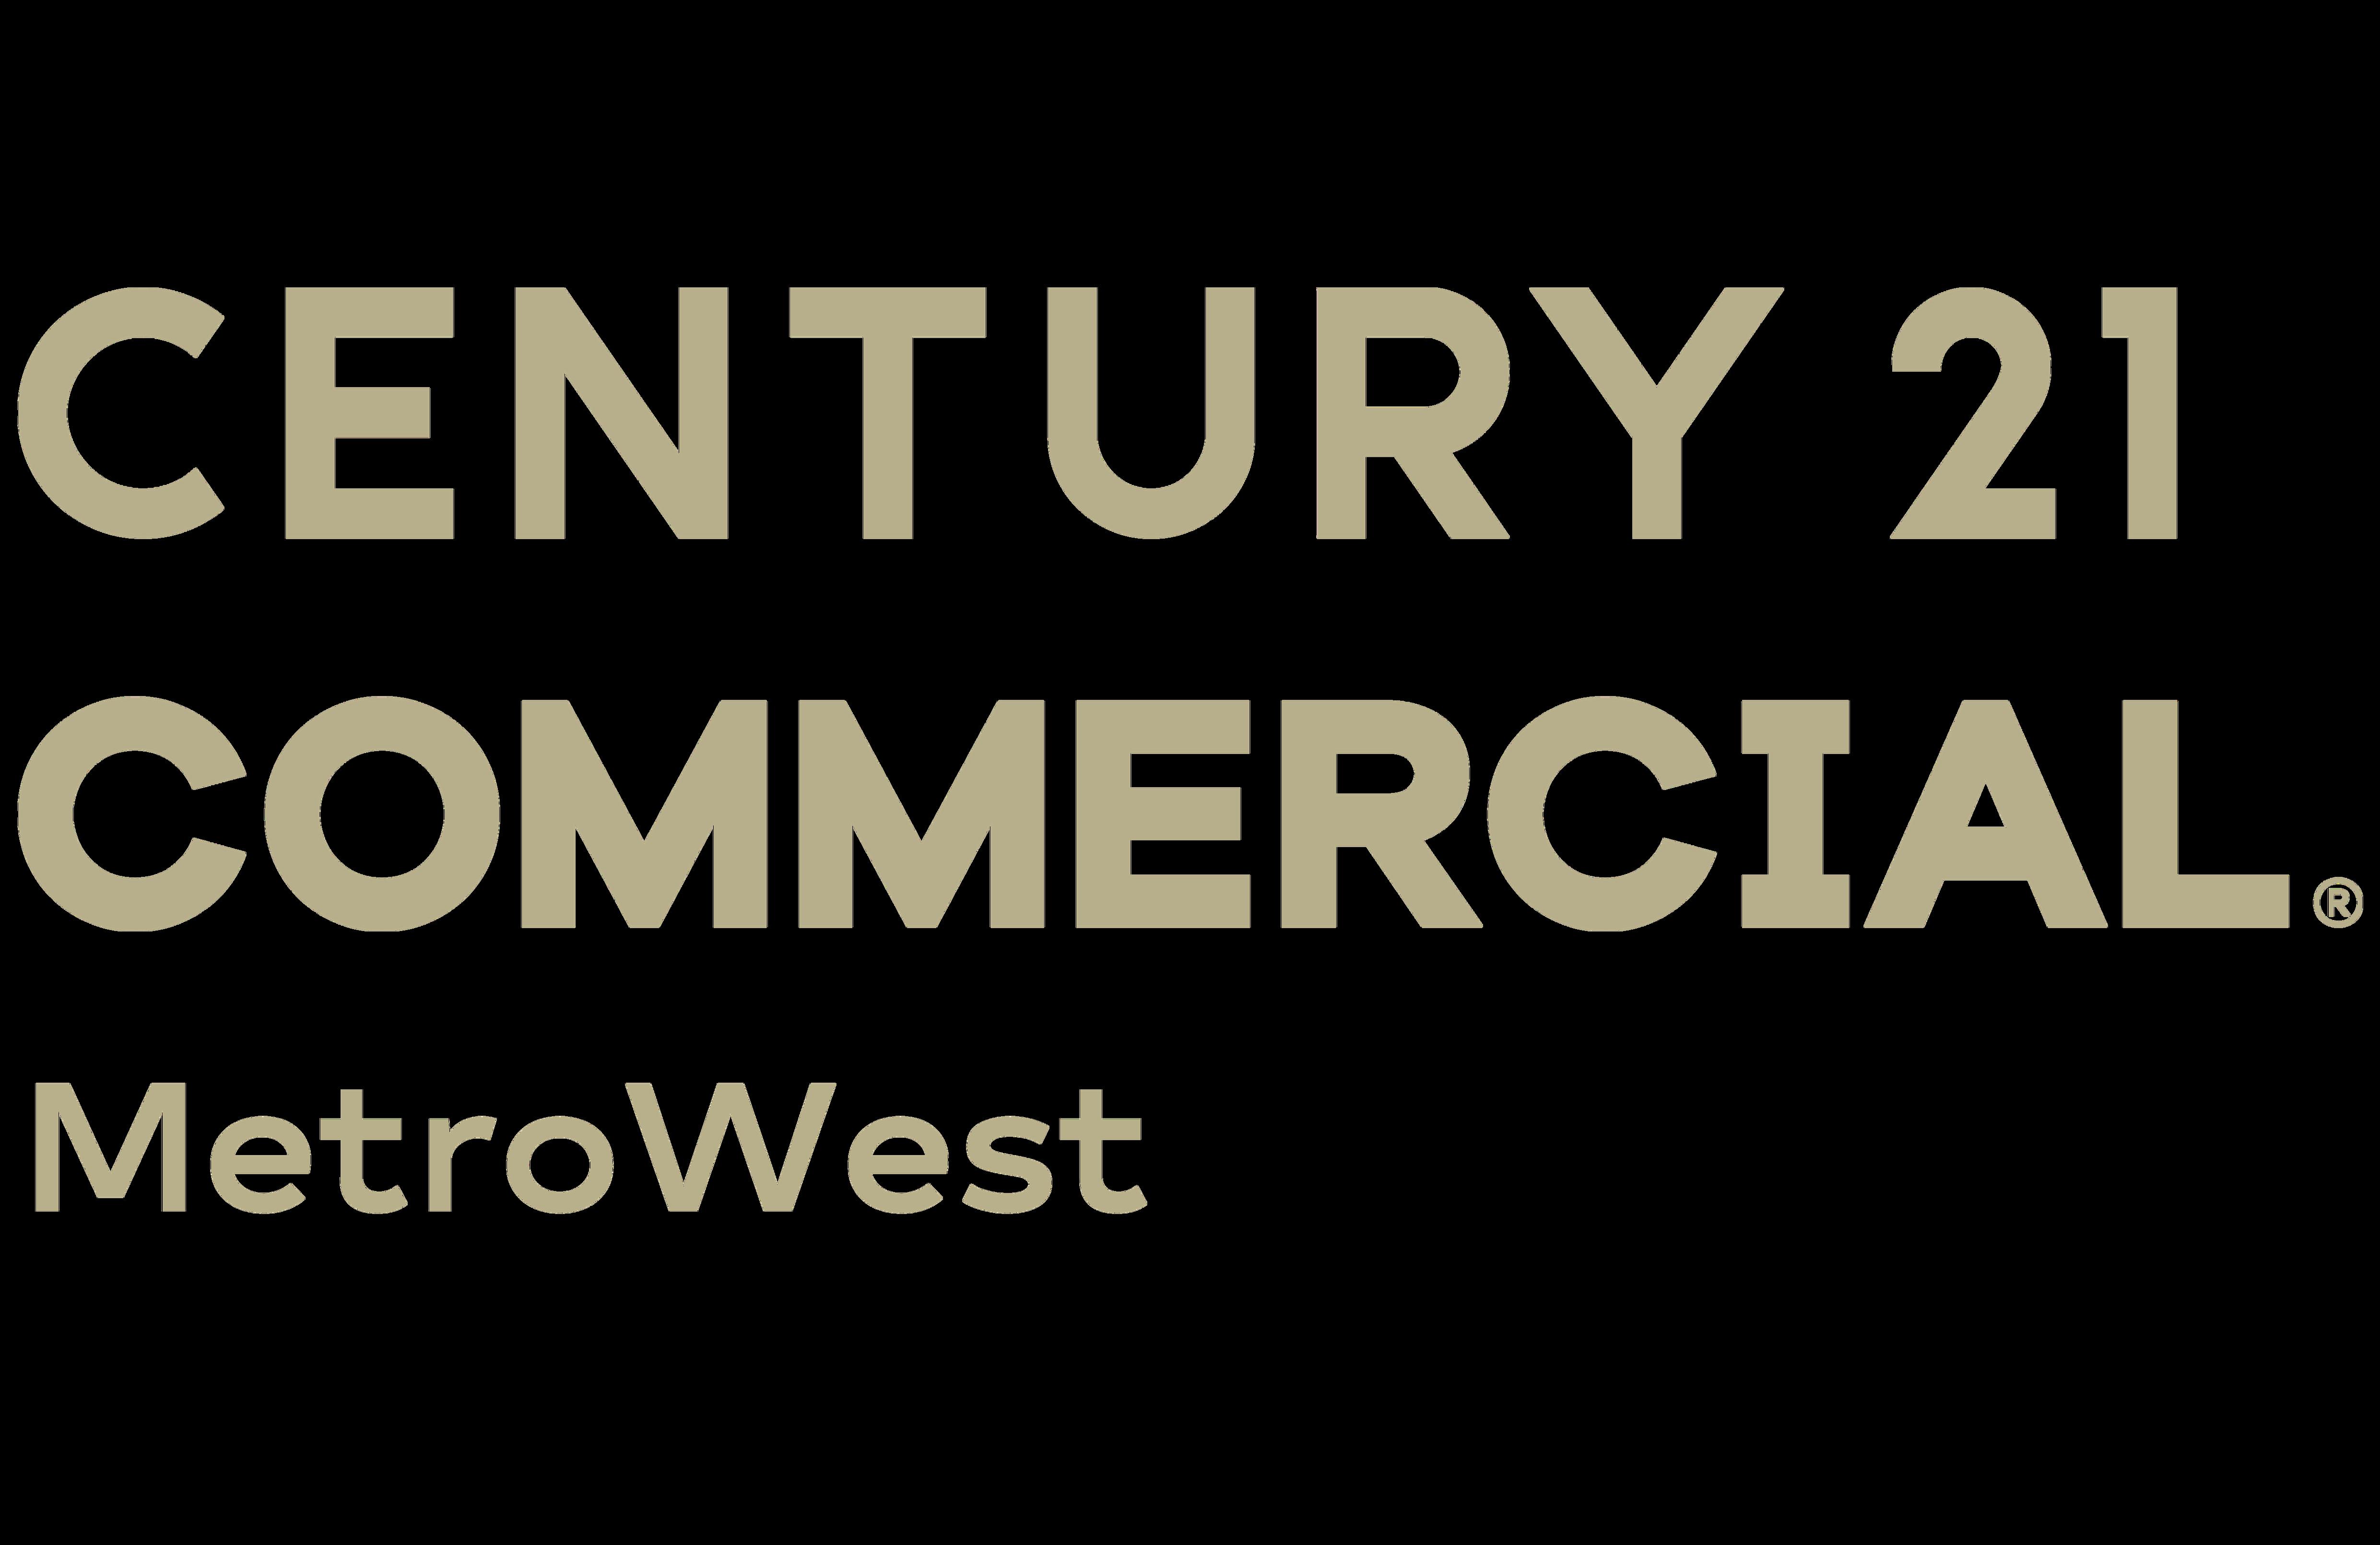 CENTURY 21 MetroWest